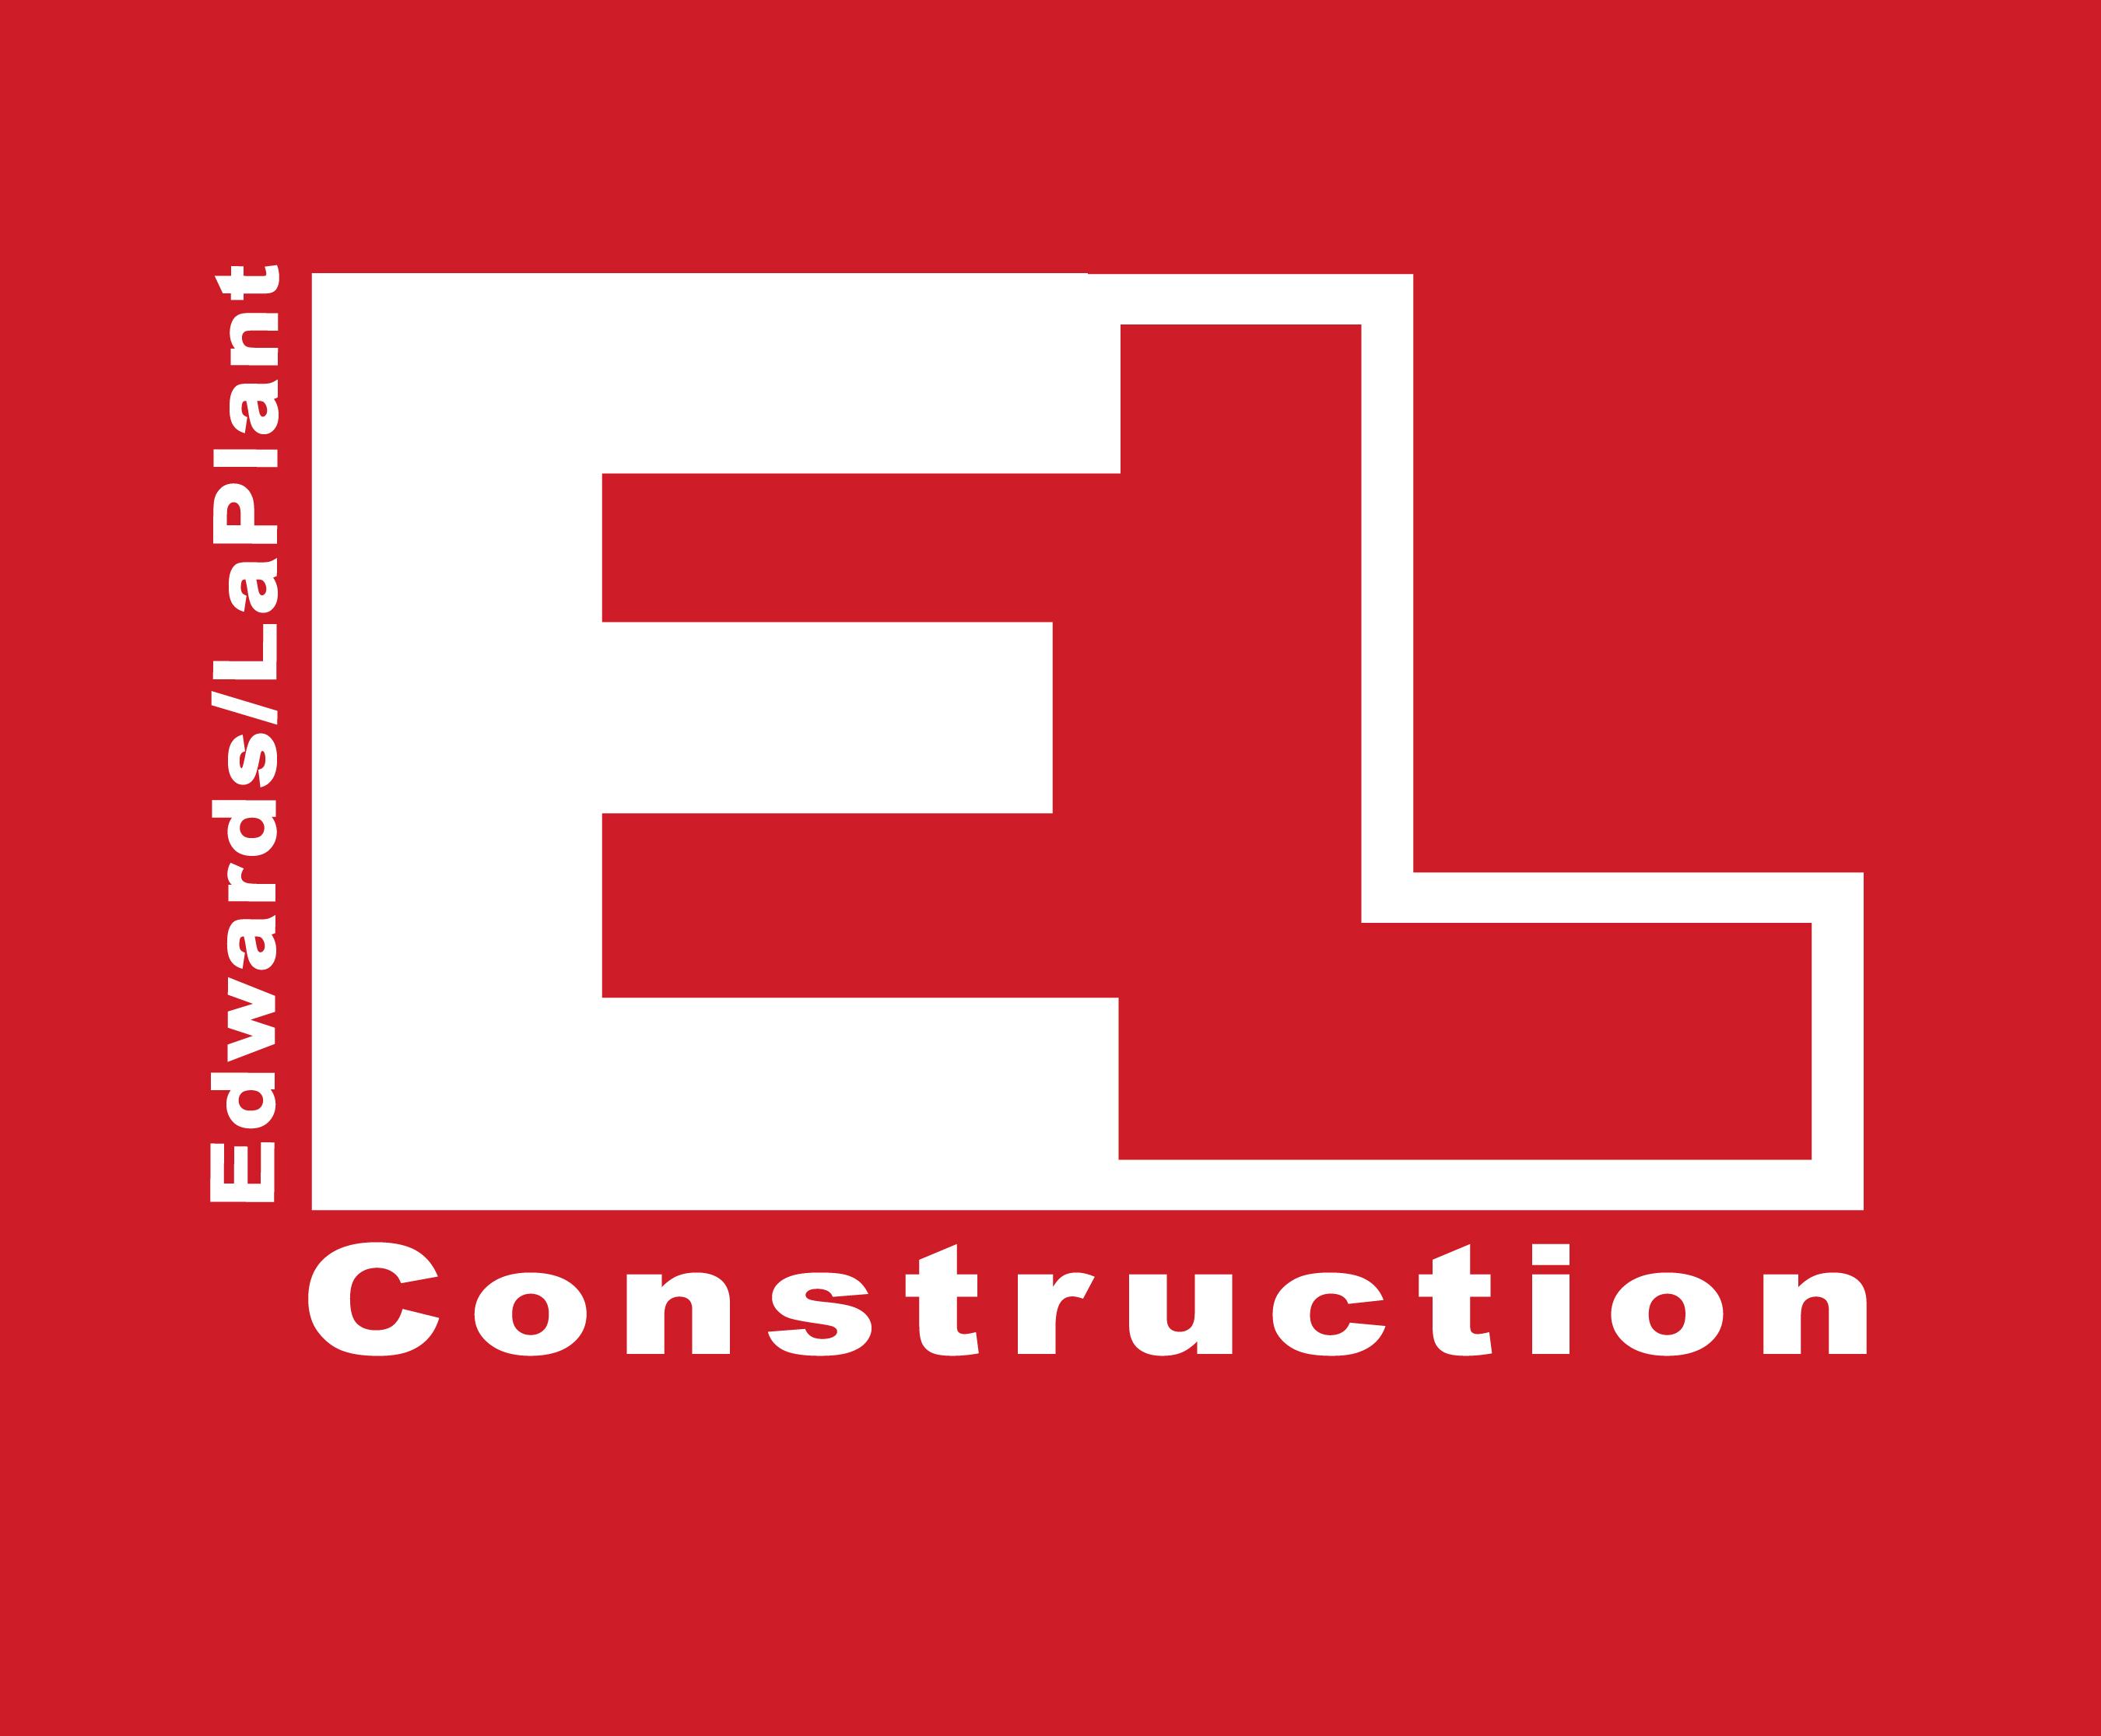 Edwards/LaPlant Construction